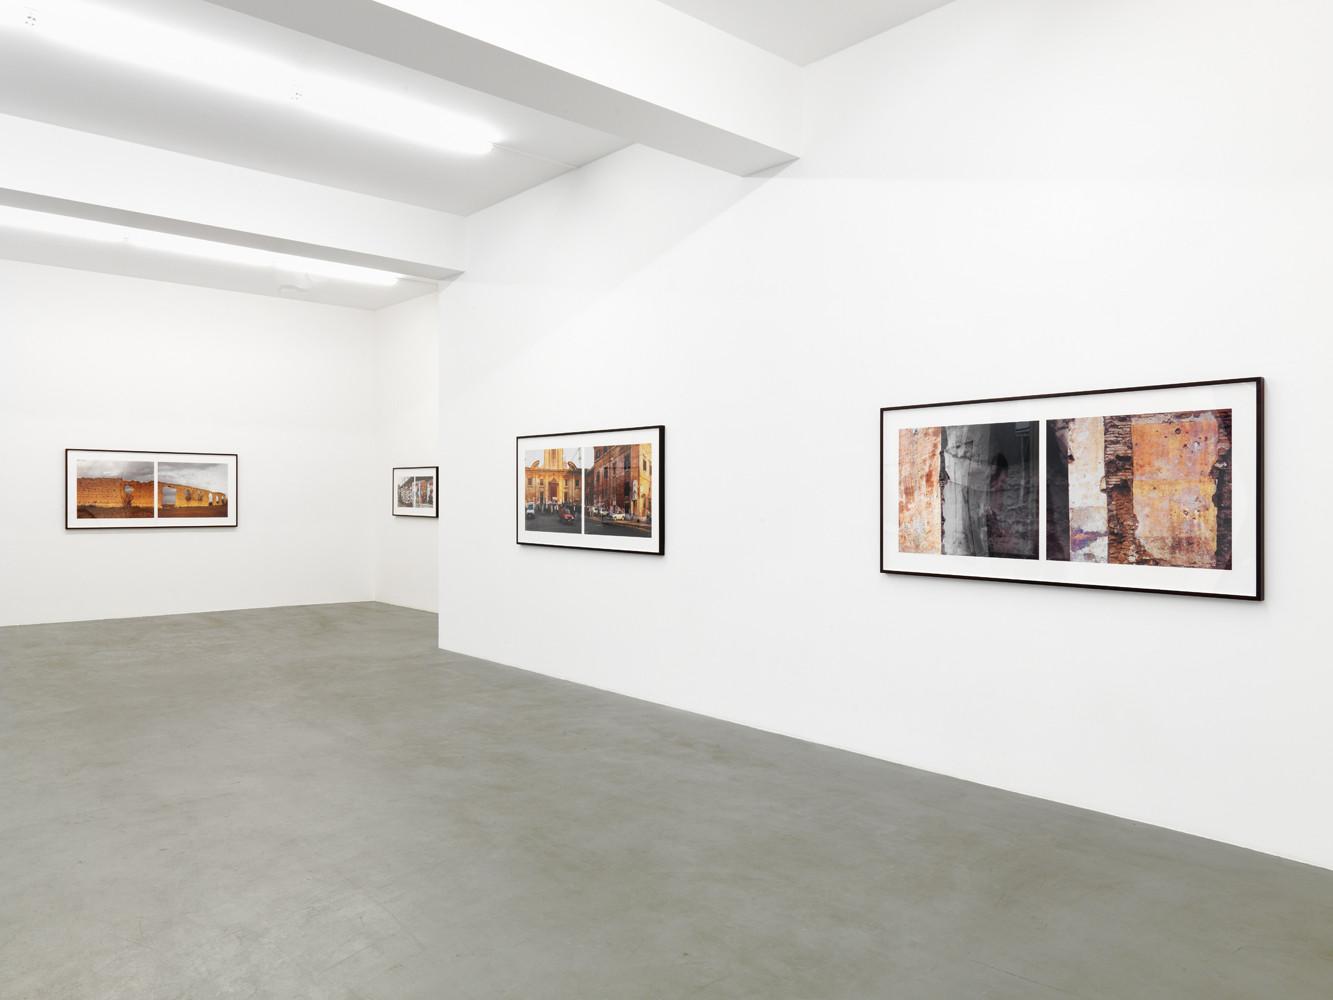 Joel Sternfeld, 'Campagna Romana', Installation view, Buchmann Galerie, 2012